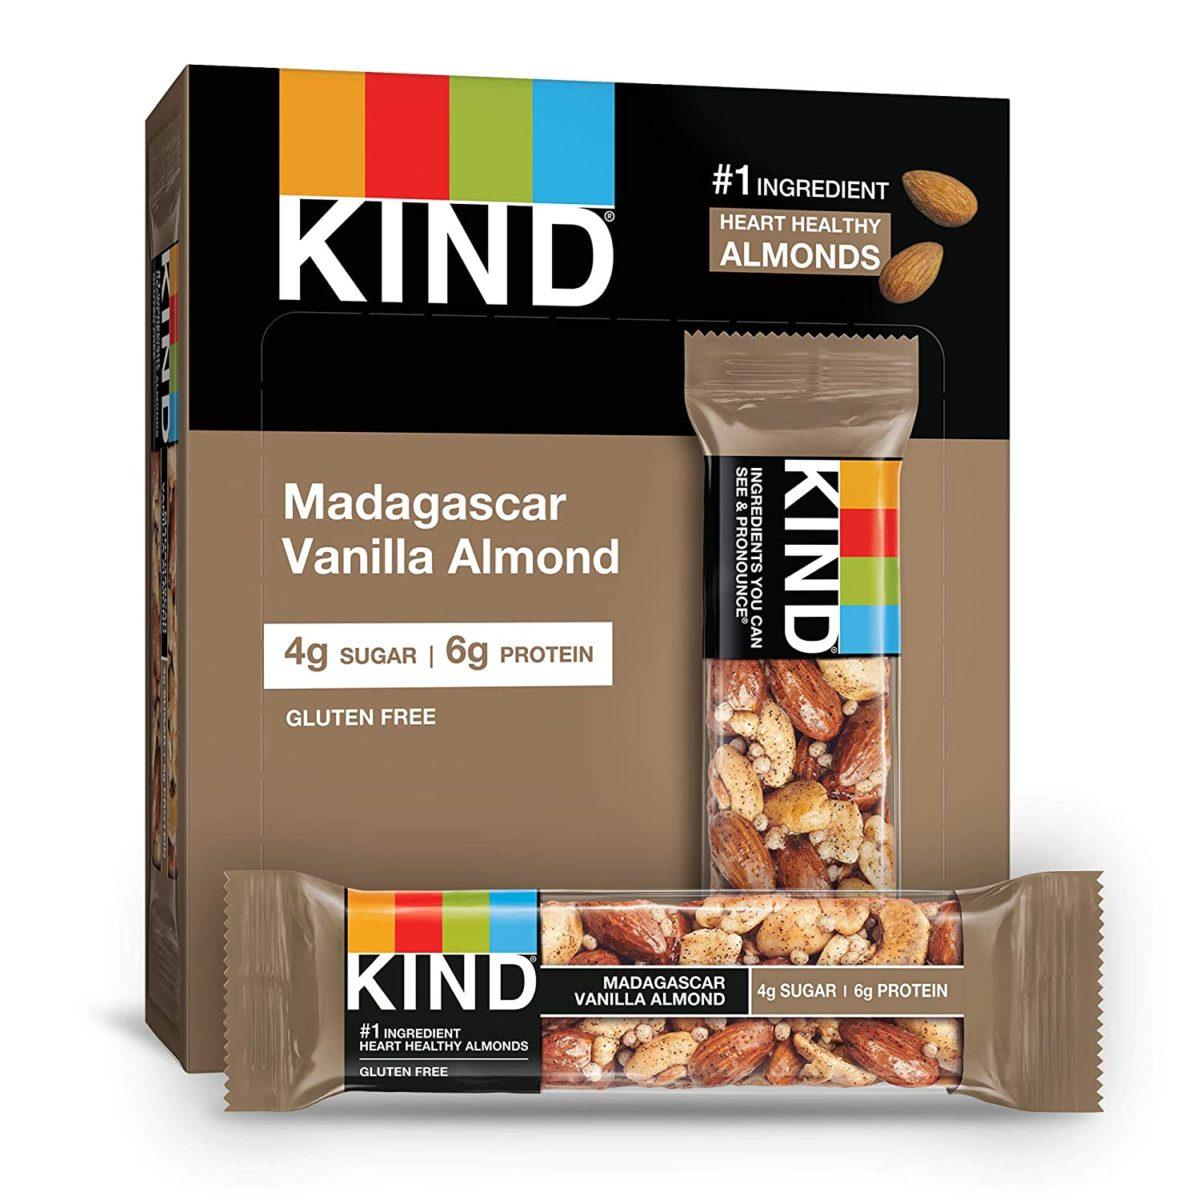 Kind Madagascar Vanilla Almond Bar